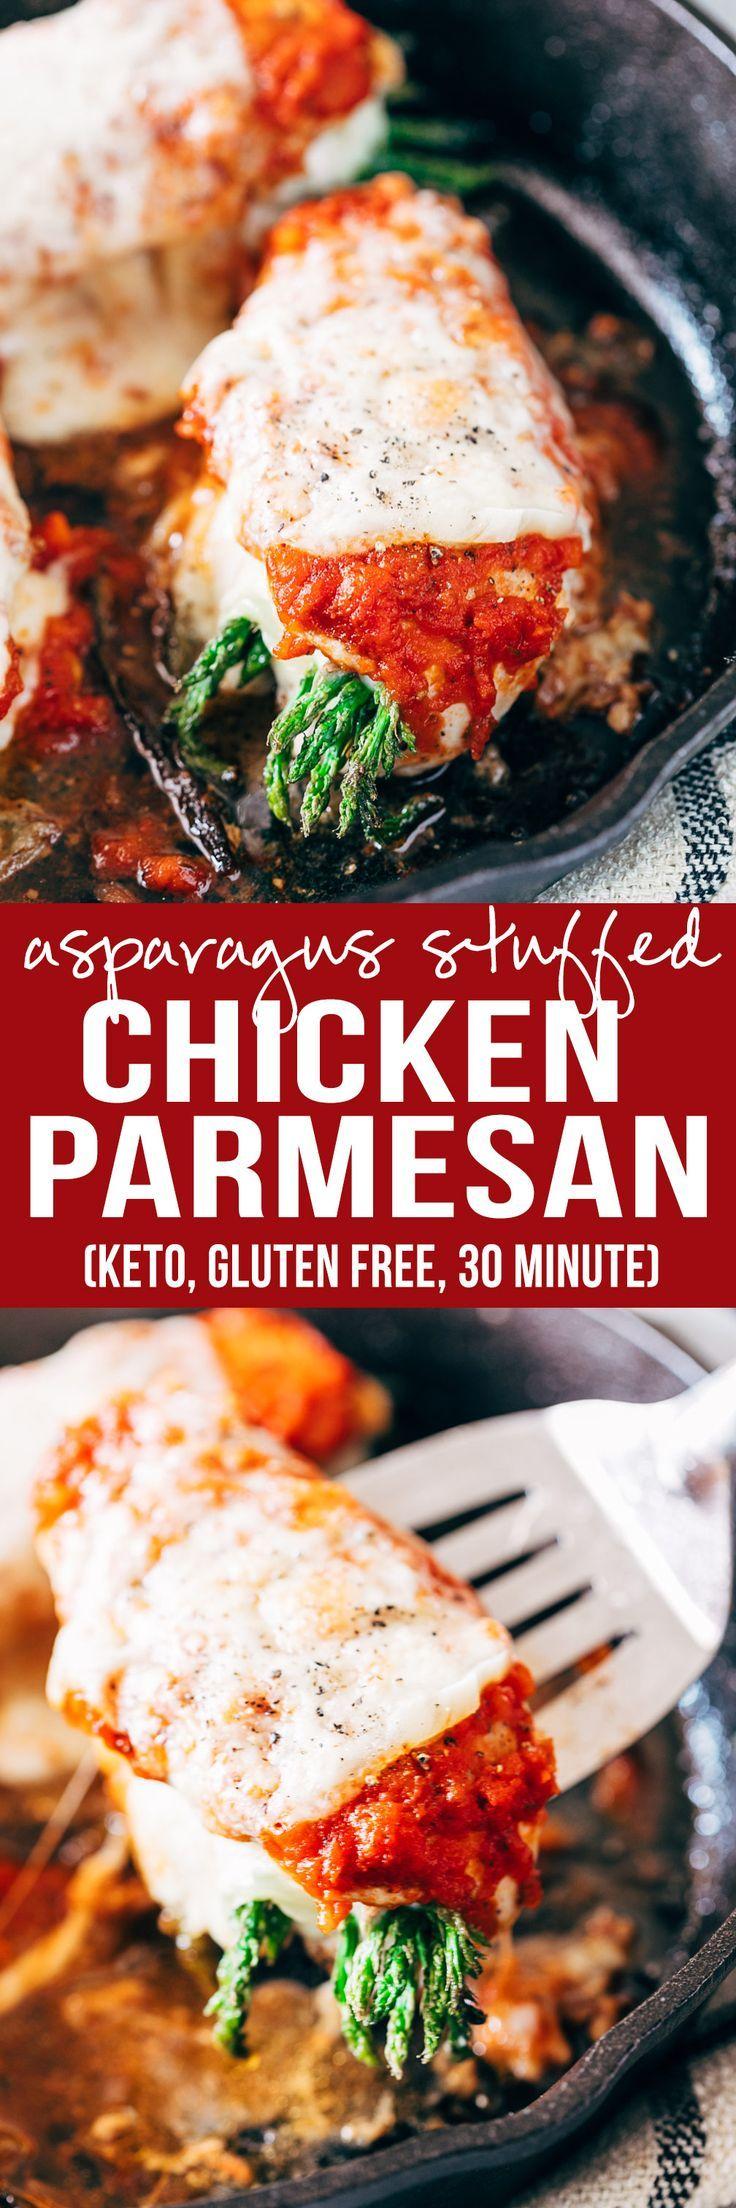 Asparagus Stuffed Chicken Parmesan is a easy, low carb, keto friendly, gluten free dinner recipe | Marinara Sauce | Cream Cheese | Fast Dinner | healthy Dinner Ideas | Cast Iron Chicken